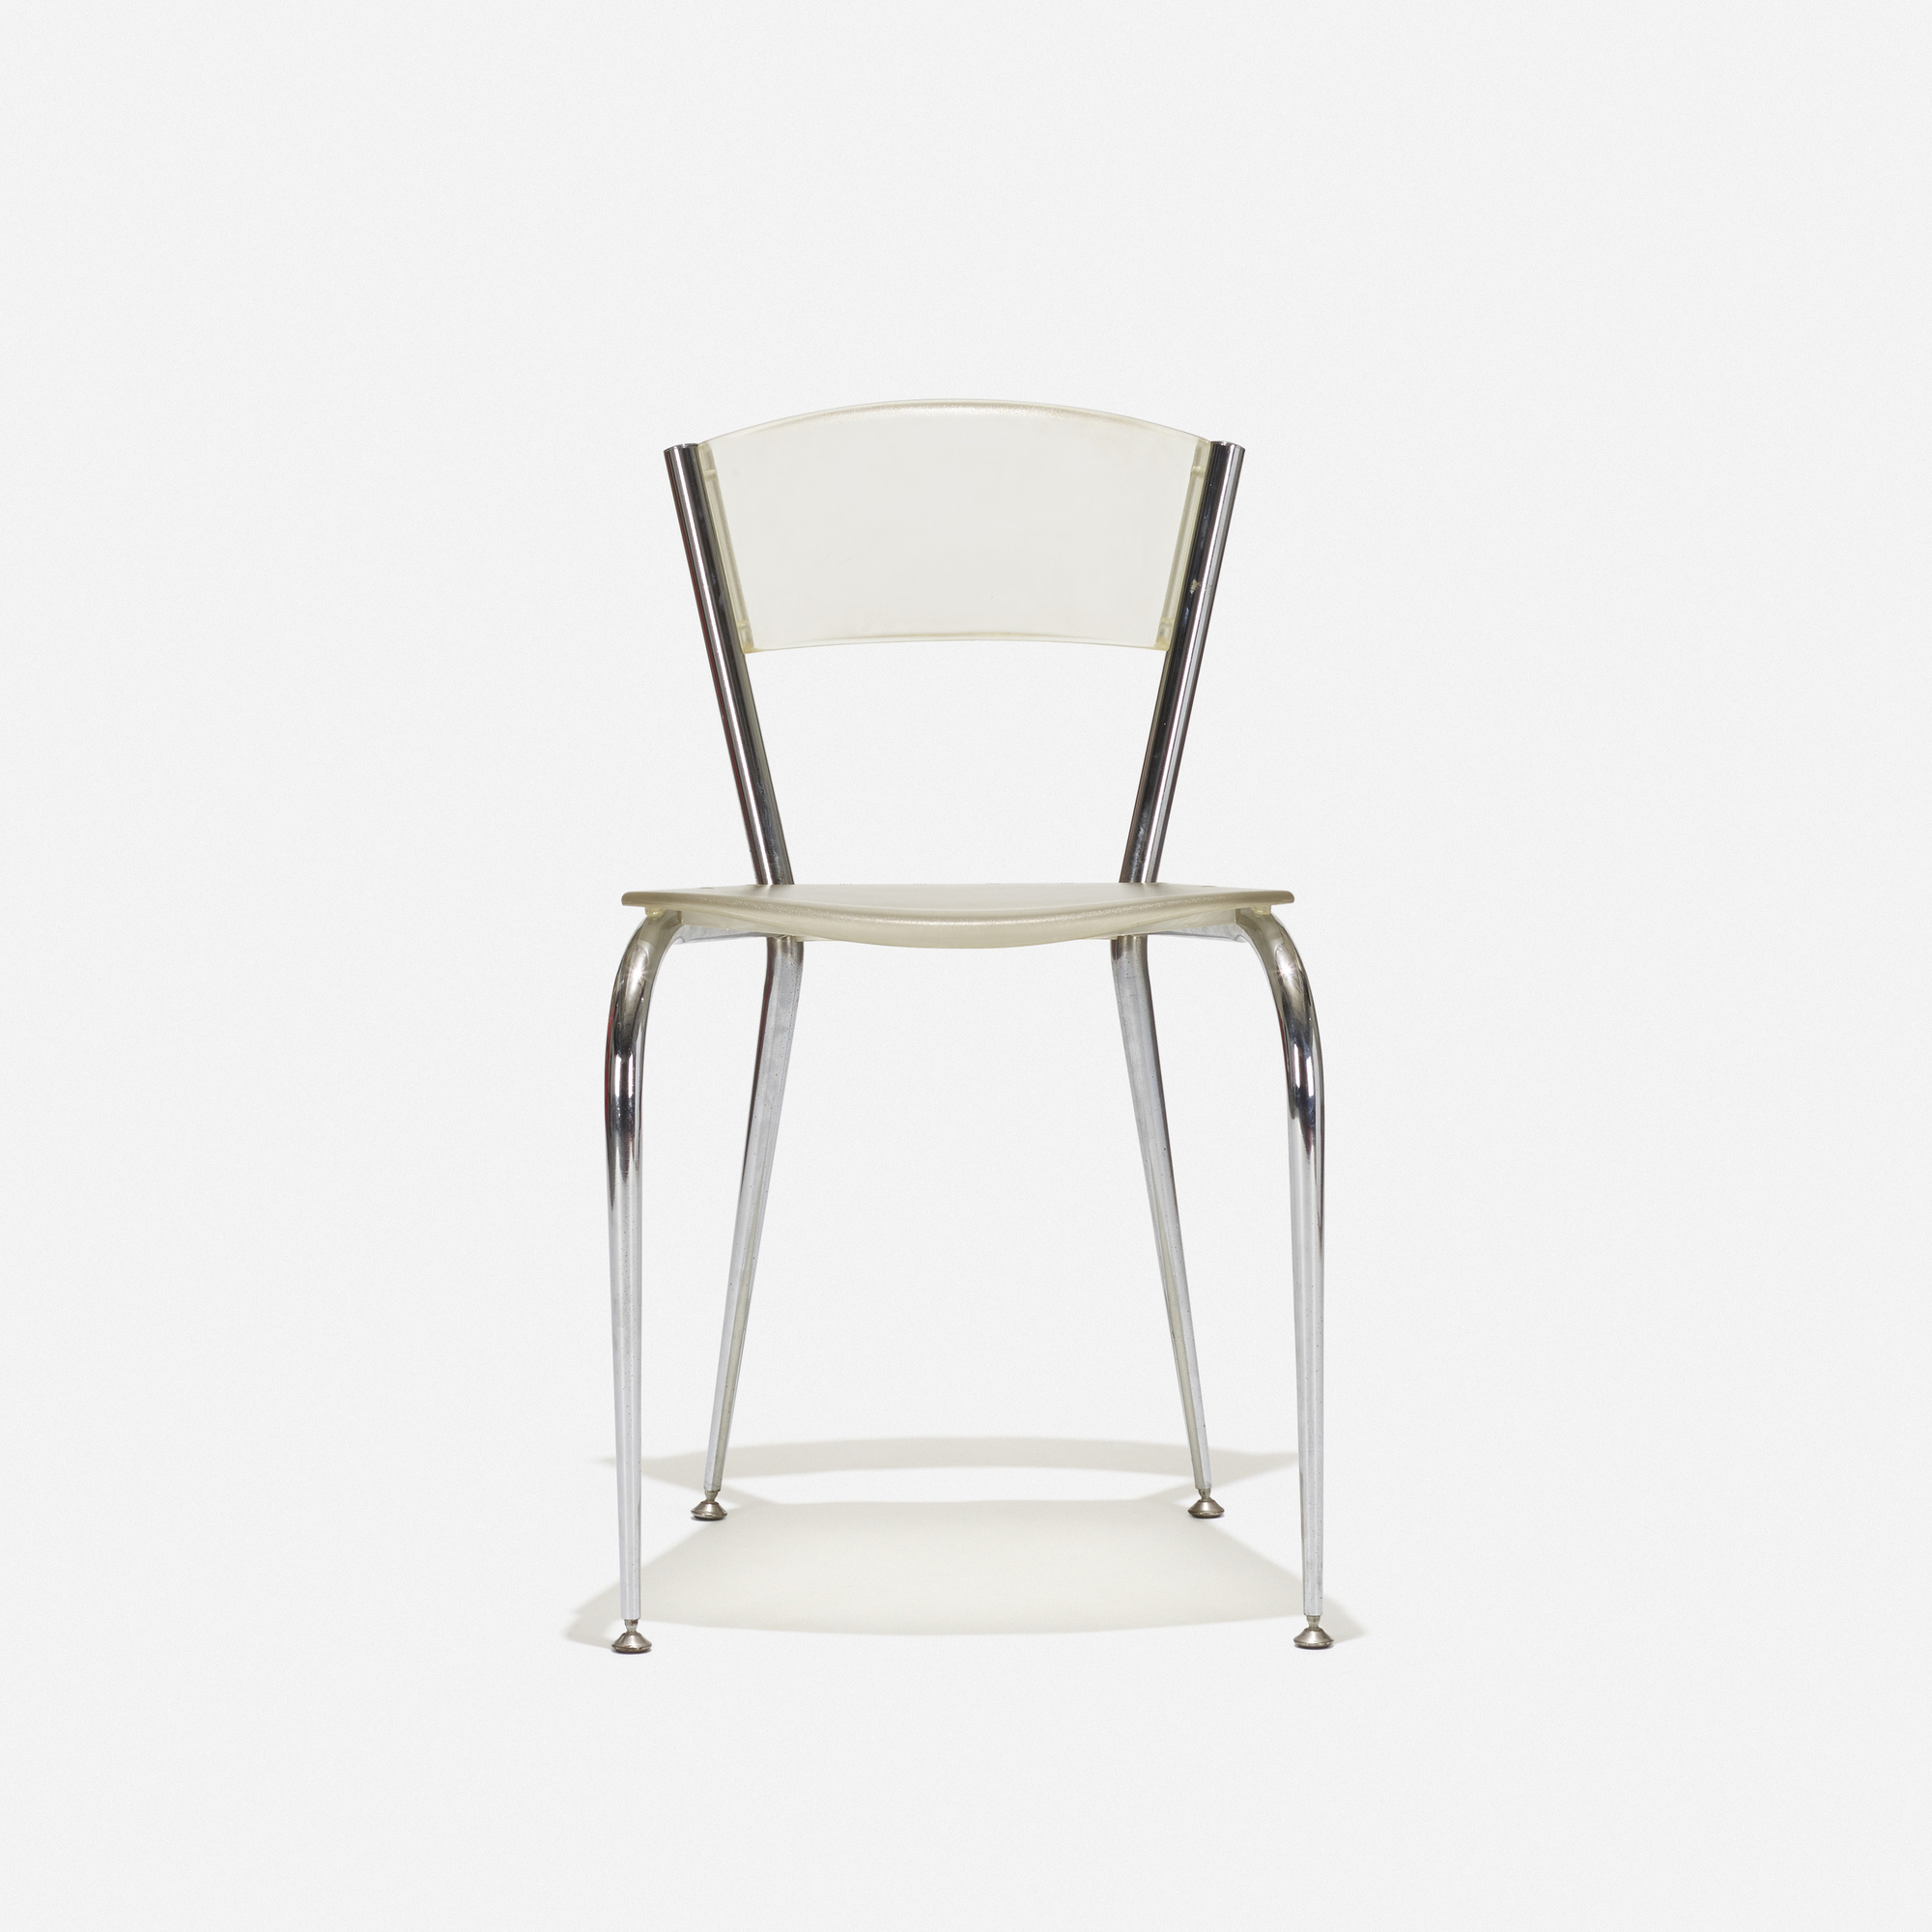 225: Enrico Baleri / Mimì chair (1 of 4)